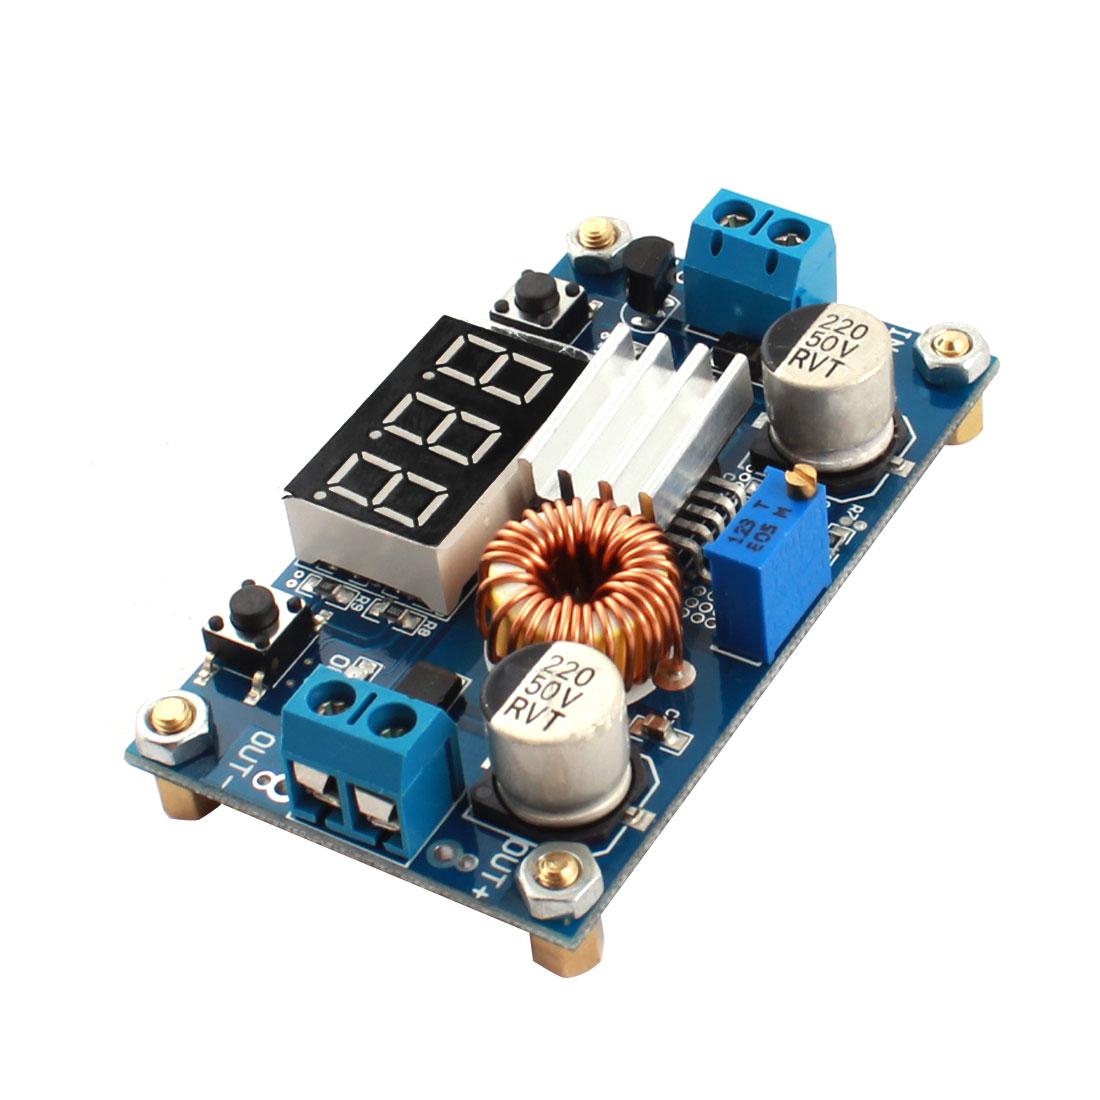 HZDZ LM2596 Micro DC Voltage Step-Down Power Supply Transformer PCB Circuit Board Module w Voltmeter